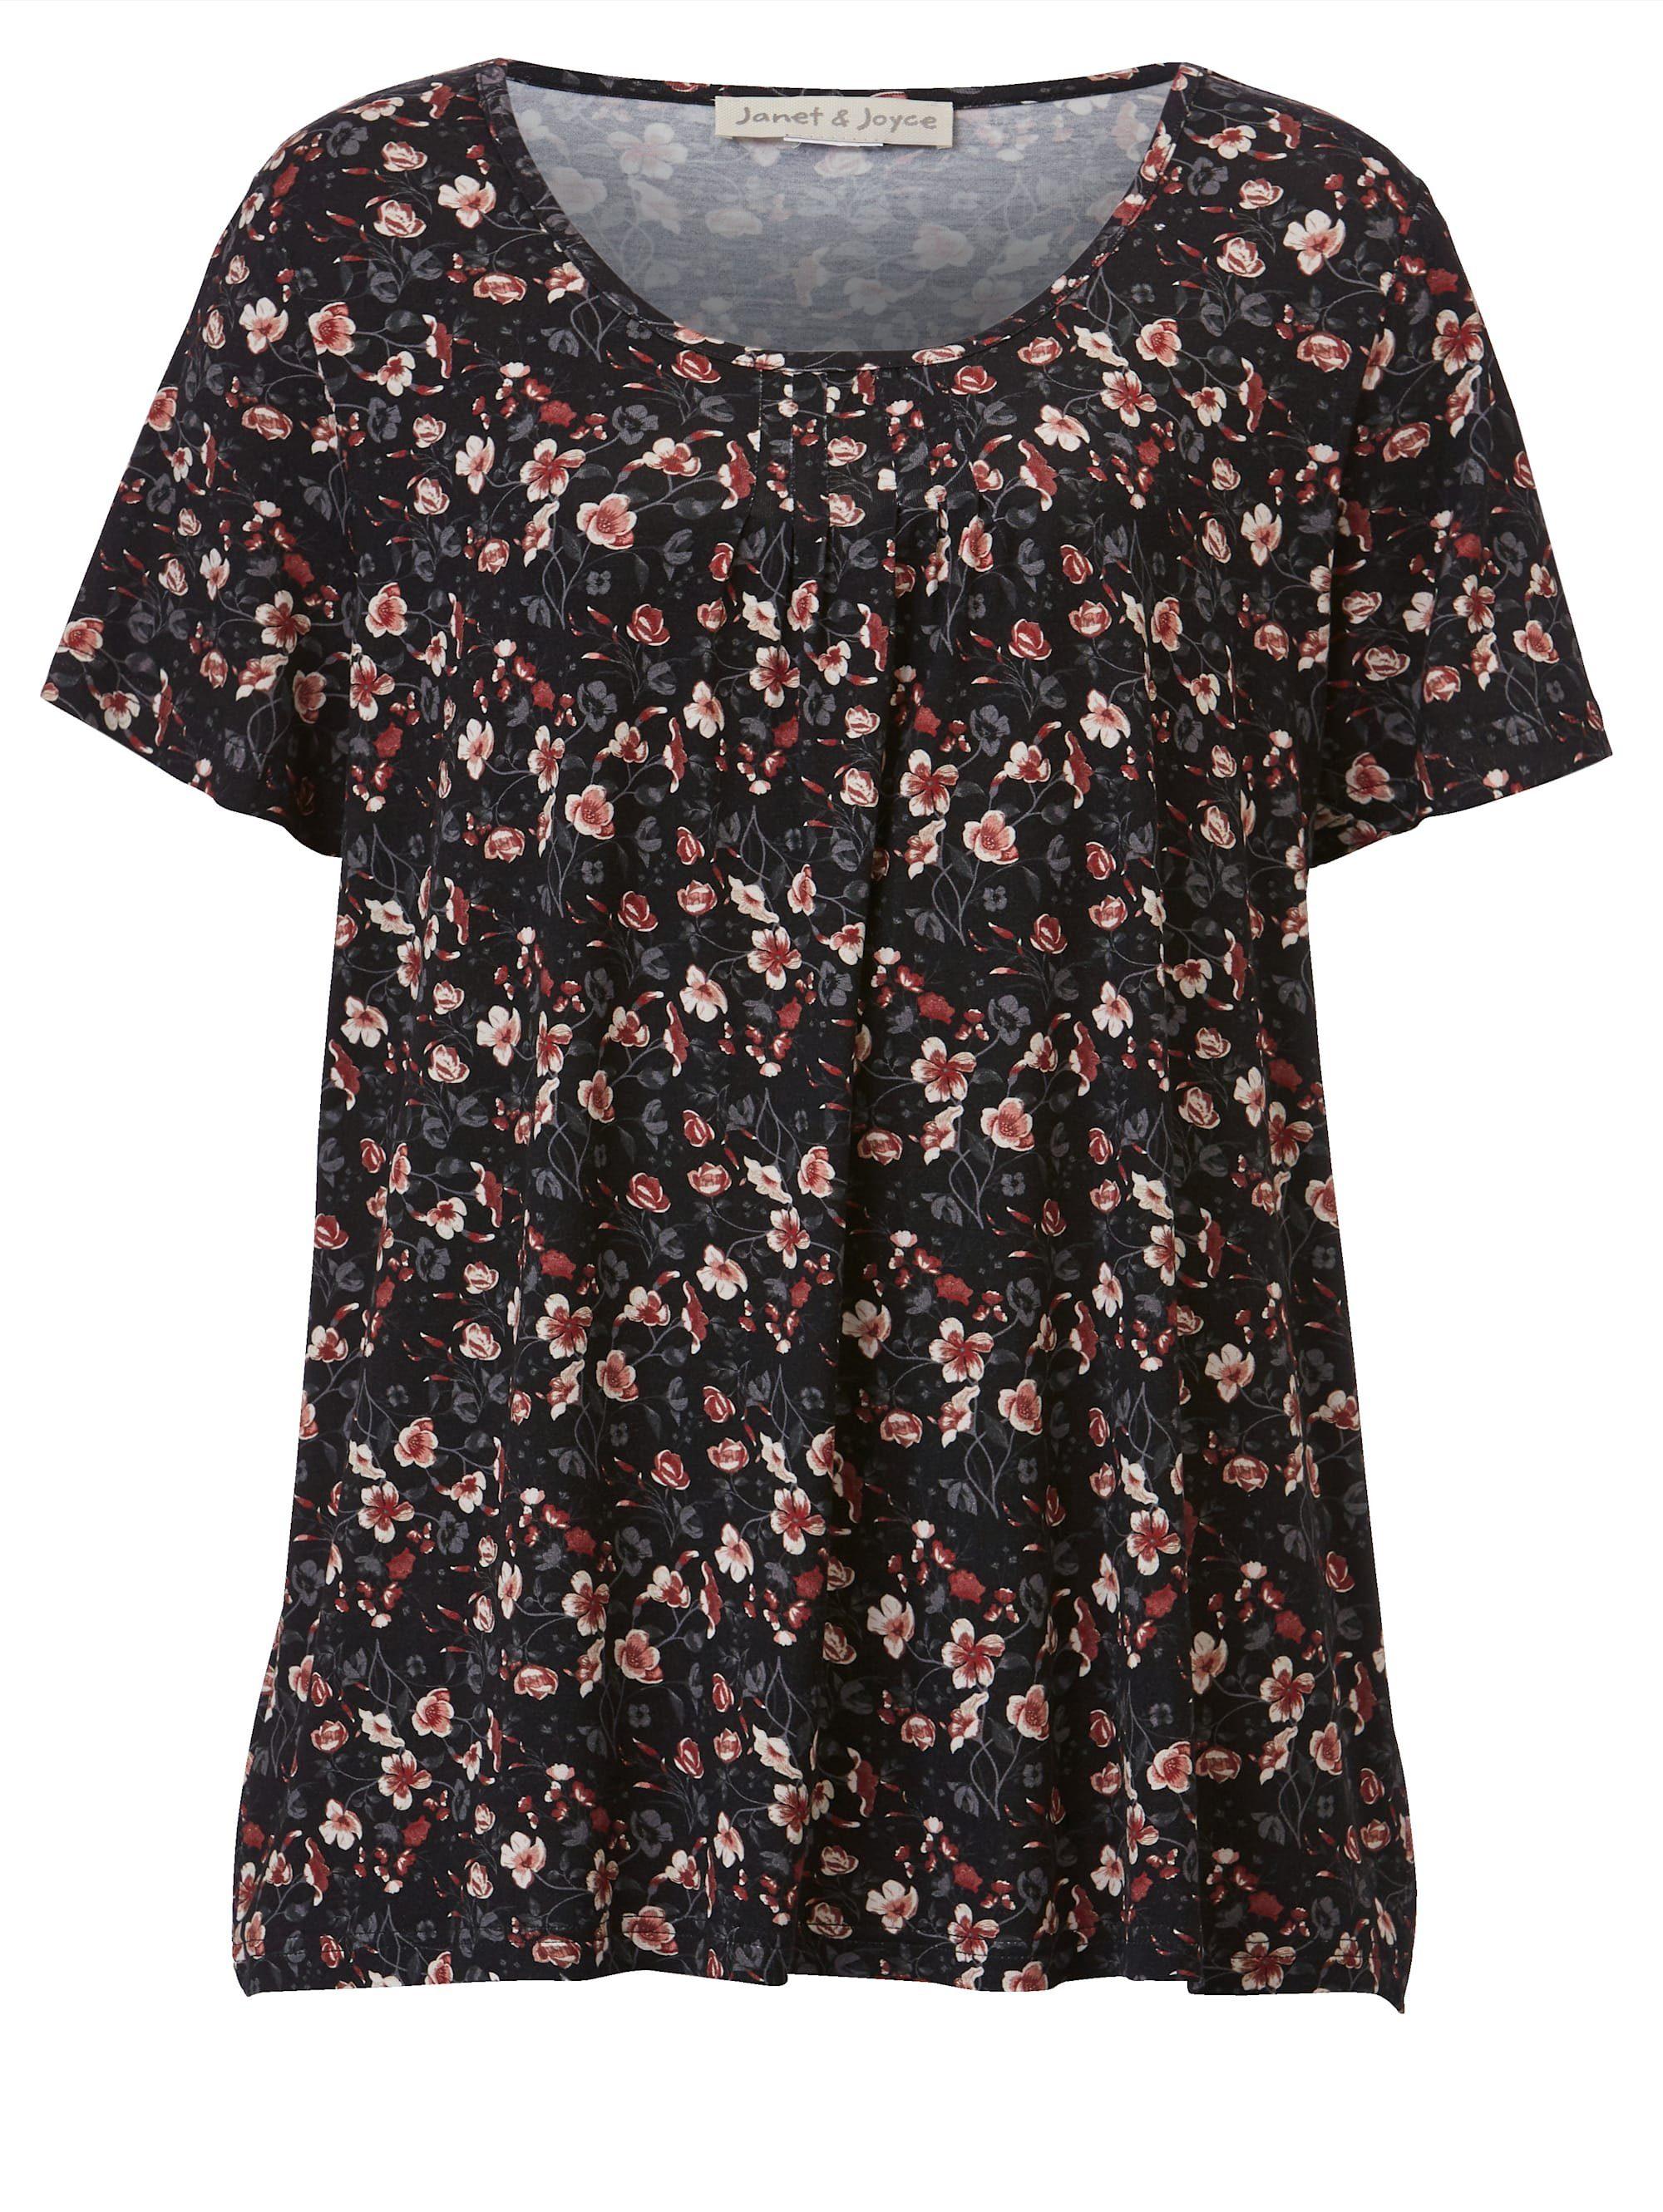 Janet & Joyce By Happy Size Shirt Mit Floralem Druck Online Kaufen qVwb8L8F